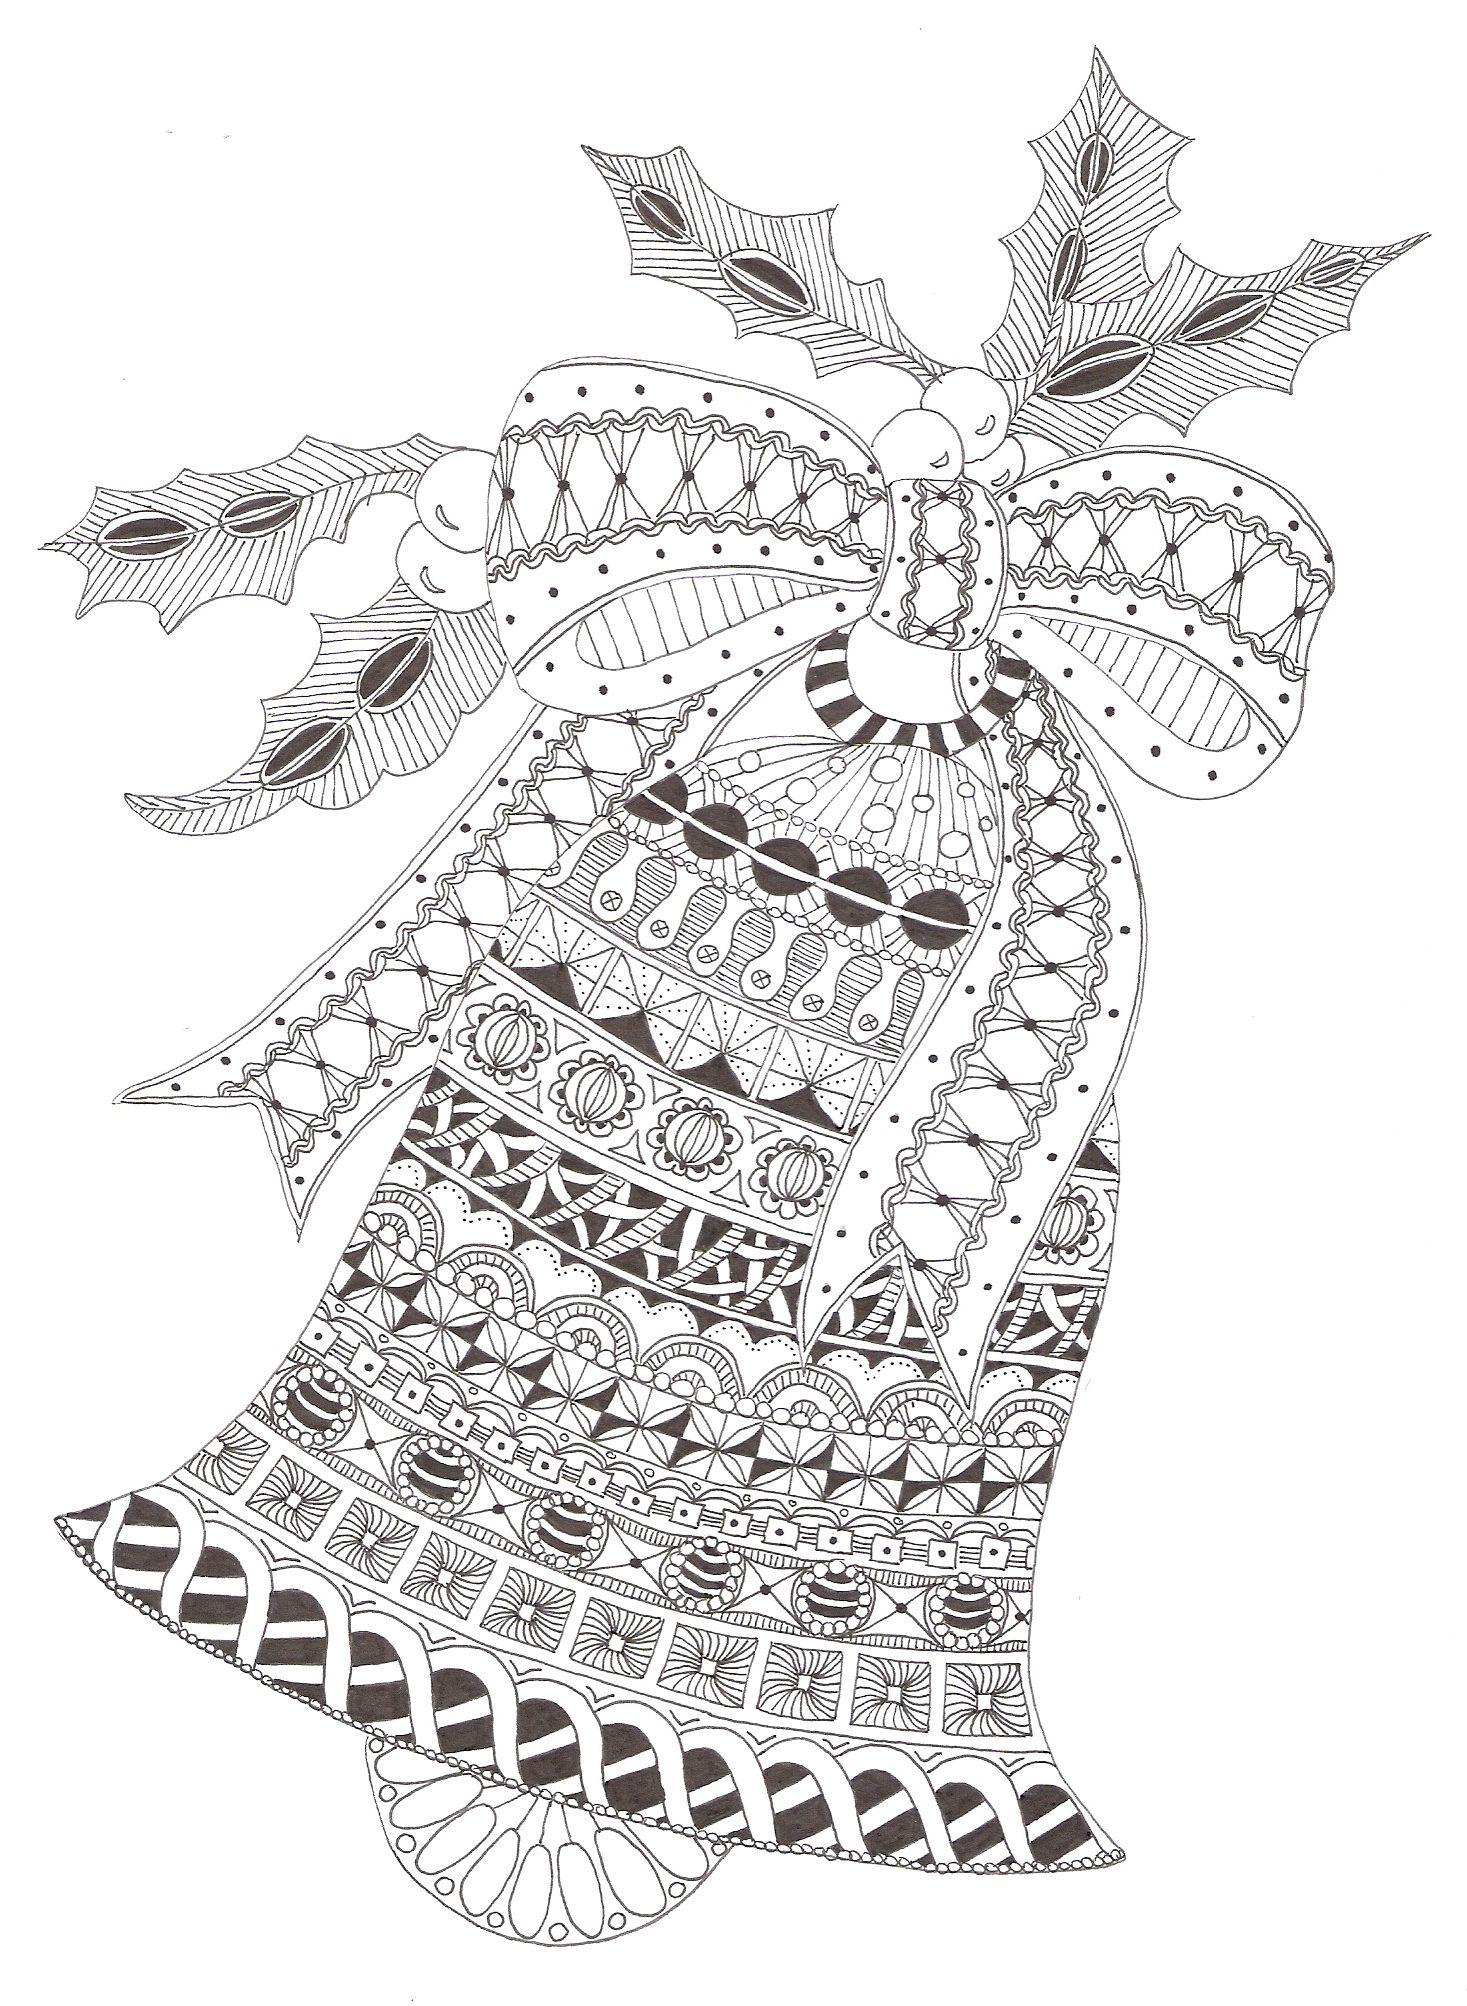 Zentangle made by mariska den boer embroidery